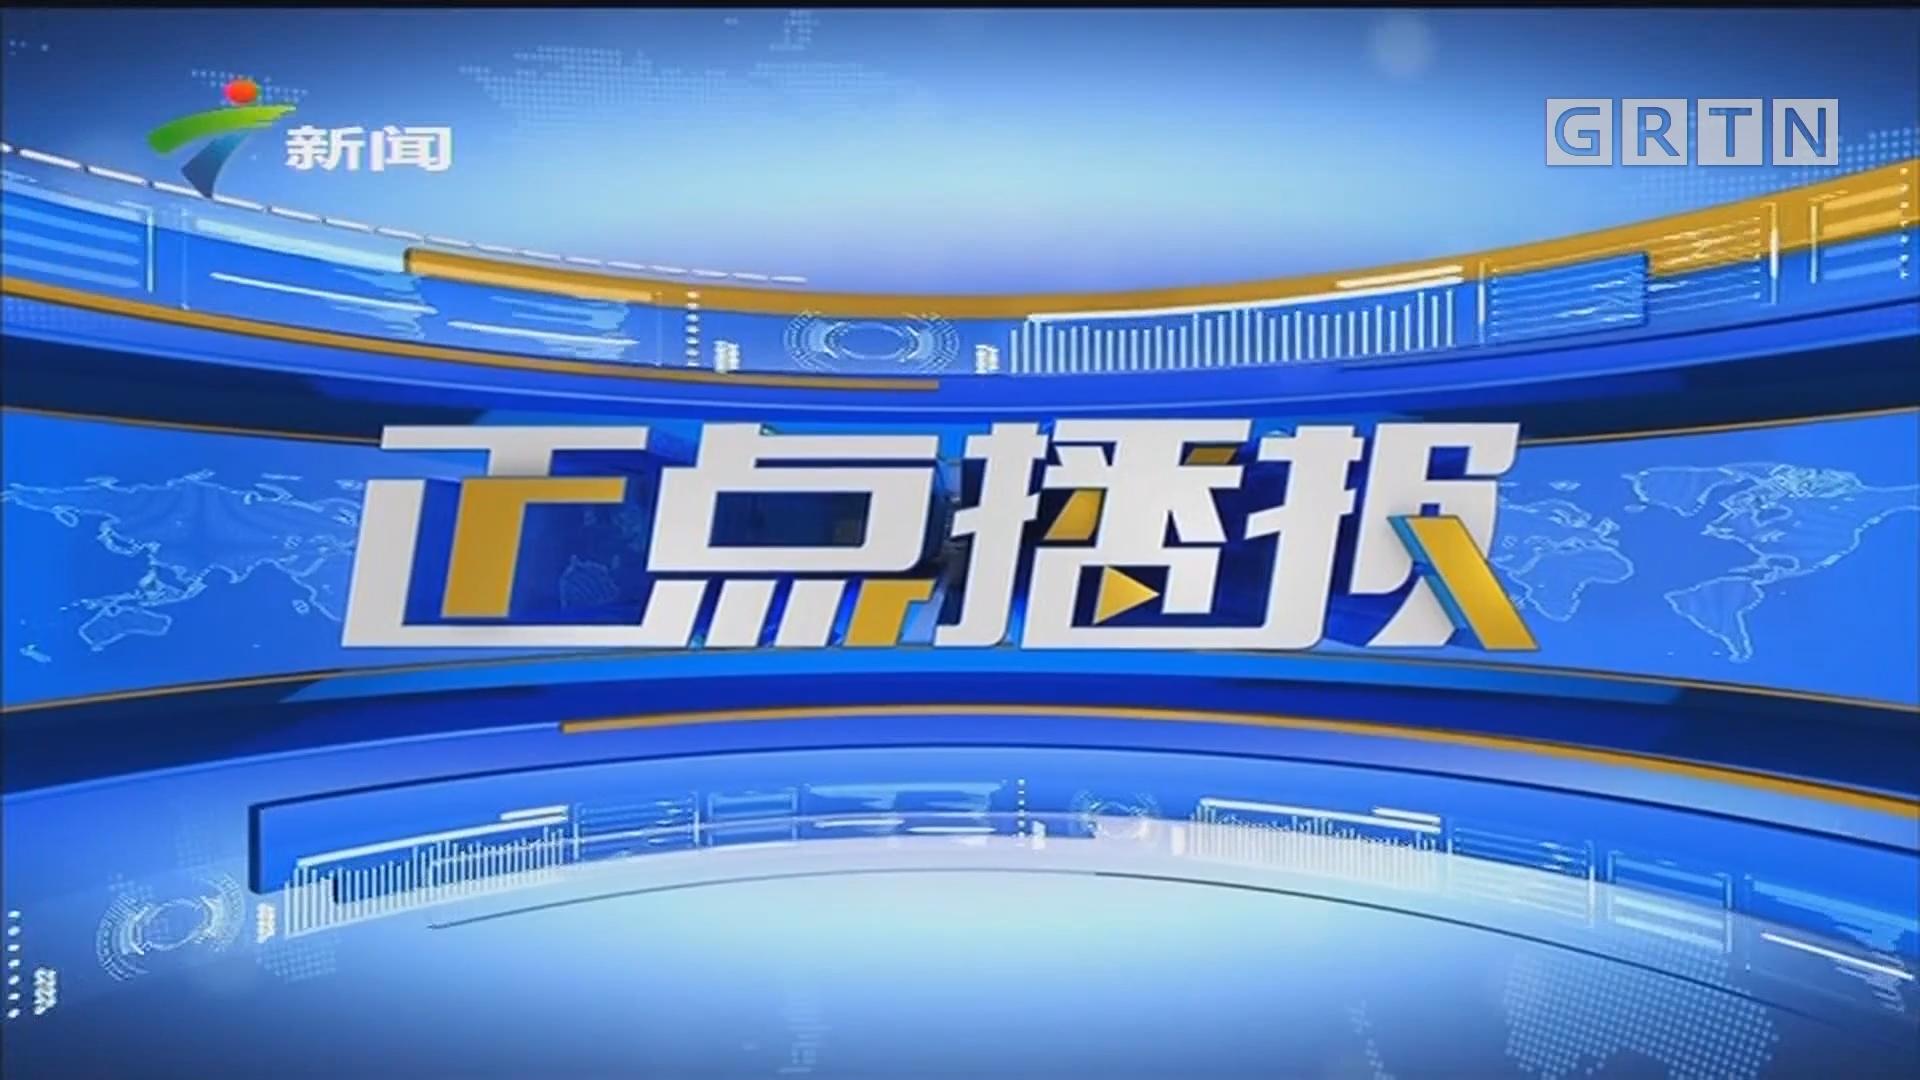 [HD][2019-08-01]正点播报:交通出行安全 广东:上半年各类交通事故数及死伤人数均下降